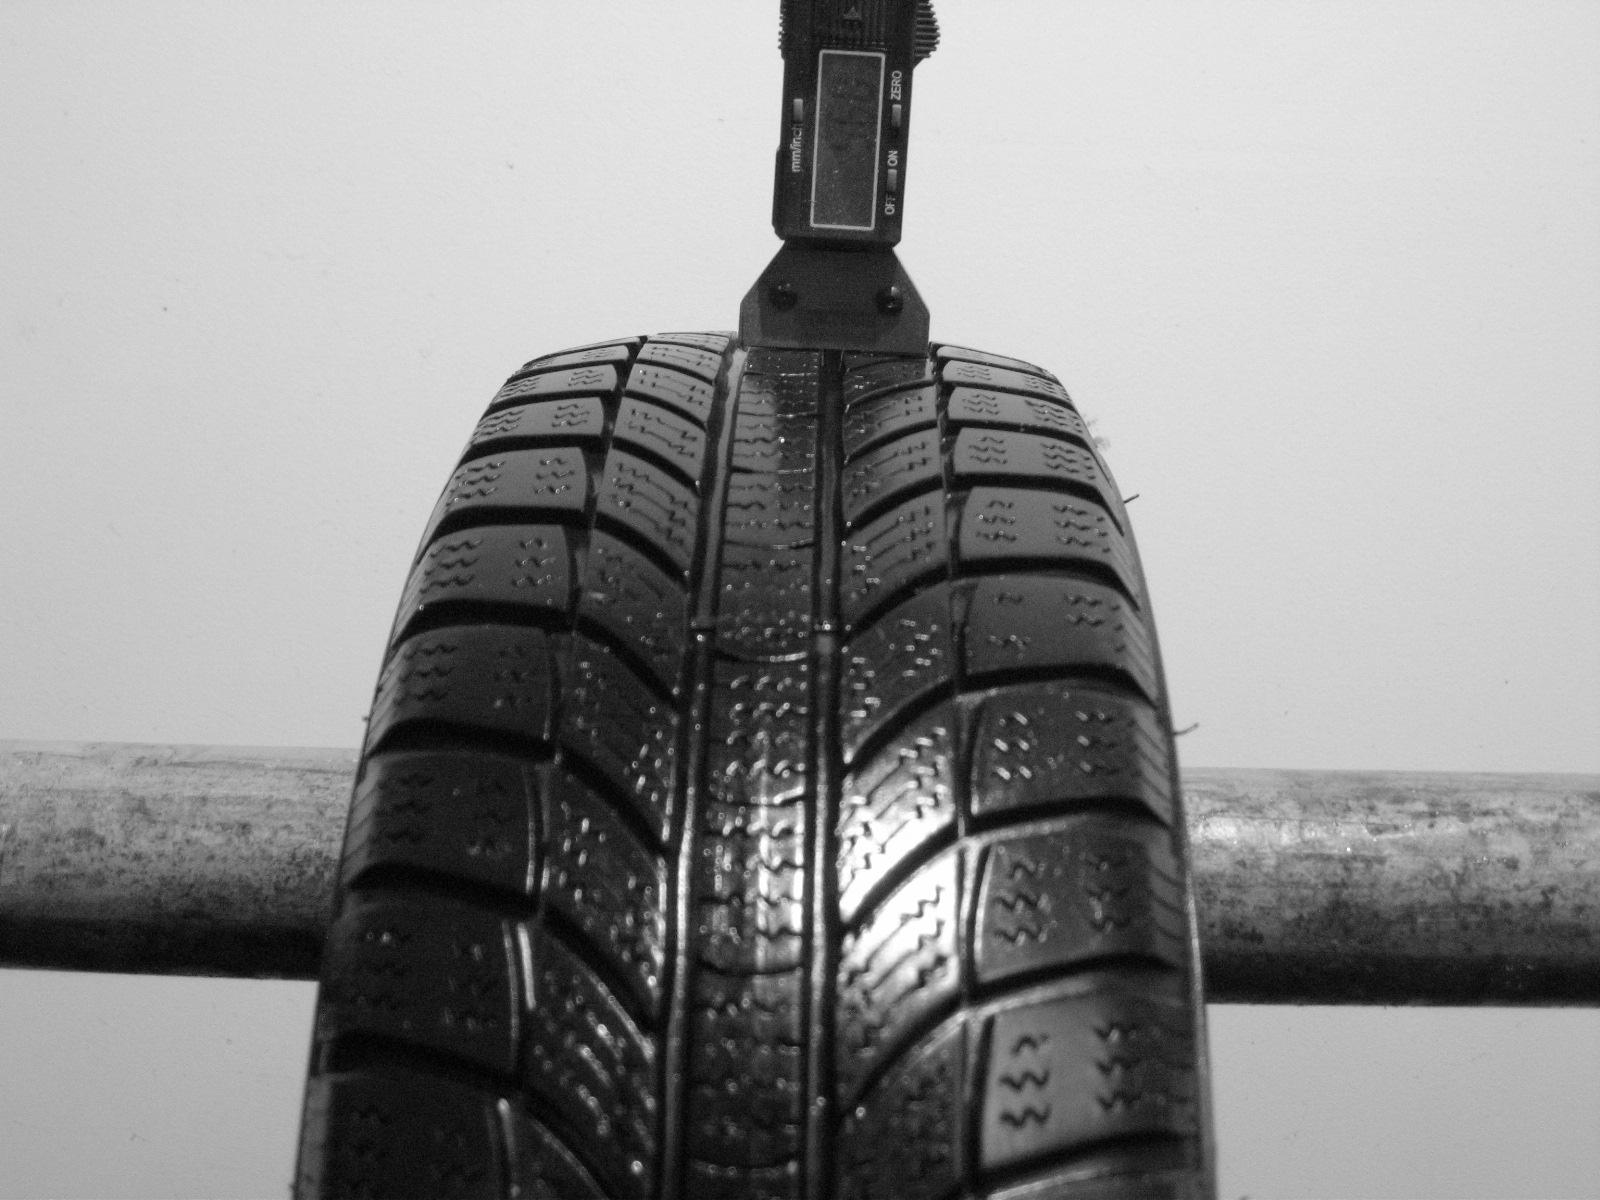 Použité-Pneu-Bazar - 165/65 R14 CHAMPIRO WINTER PRO-kusovka-rezerva 3mm